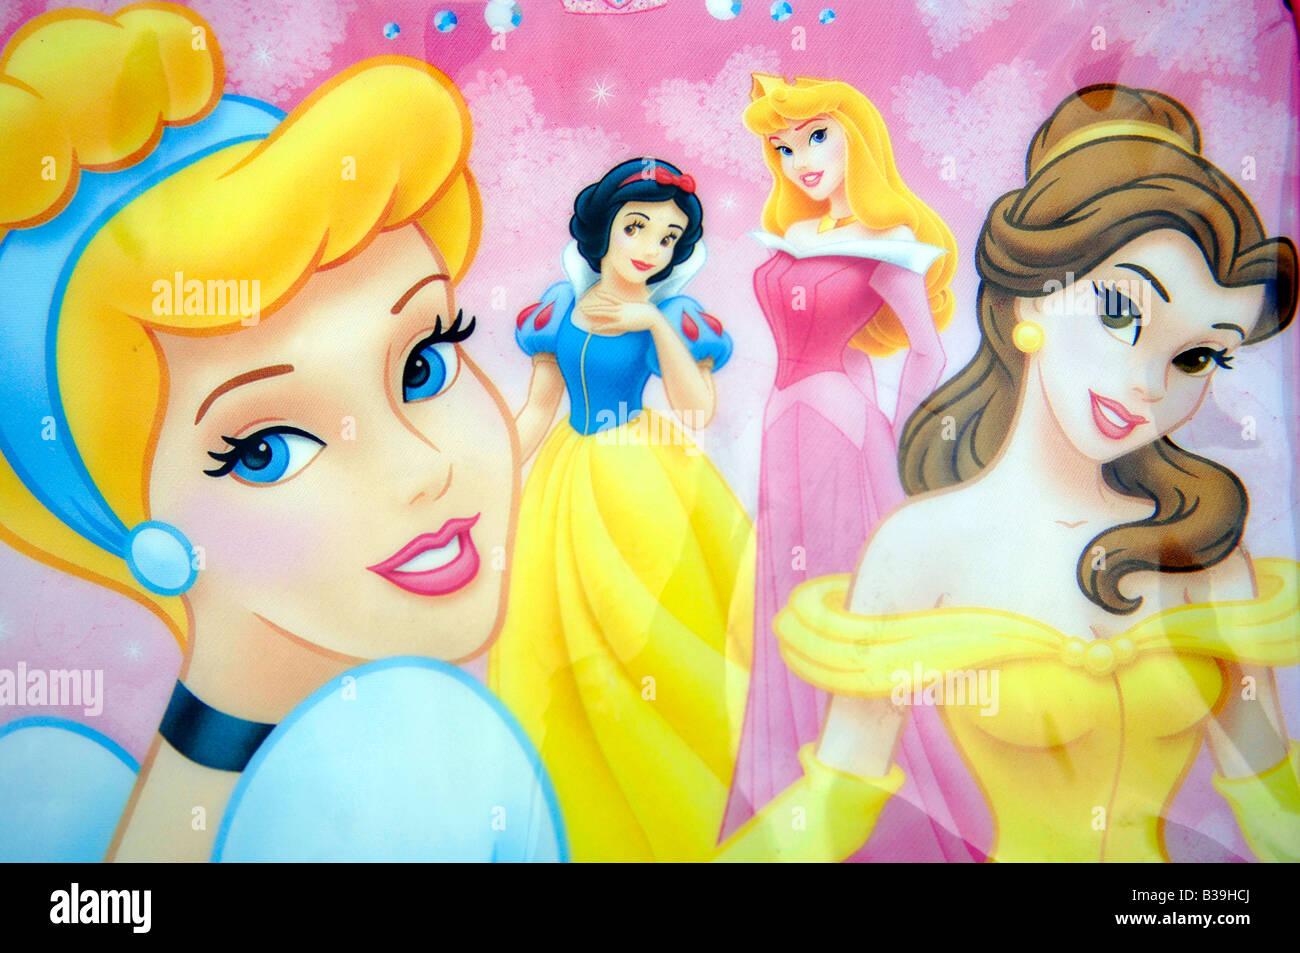 Cuatro Princesas Disney Snow White Personajes Femeninos De